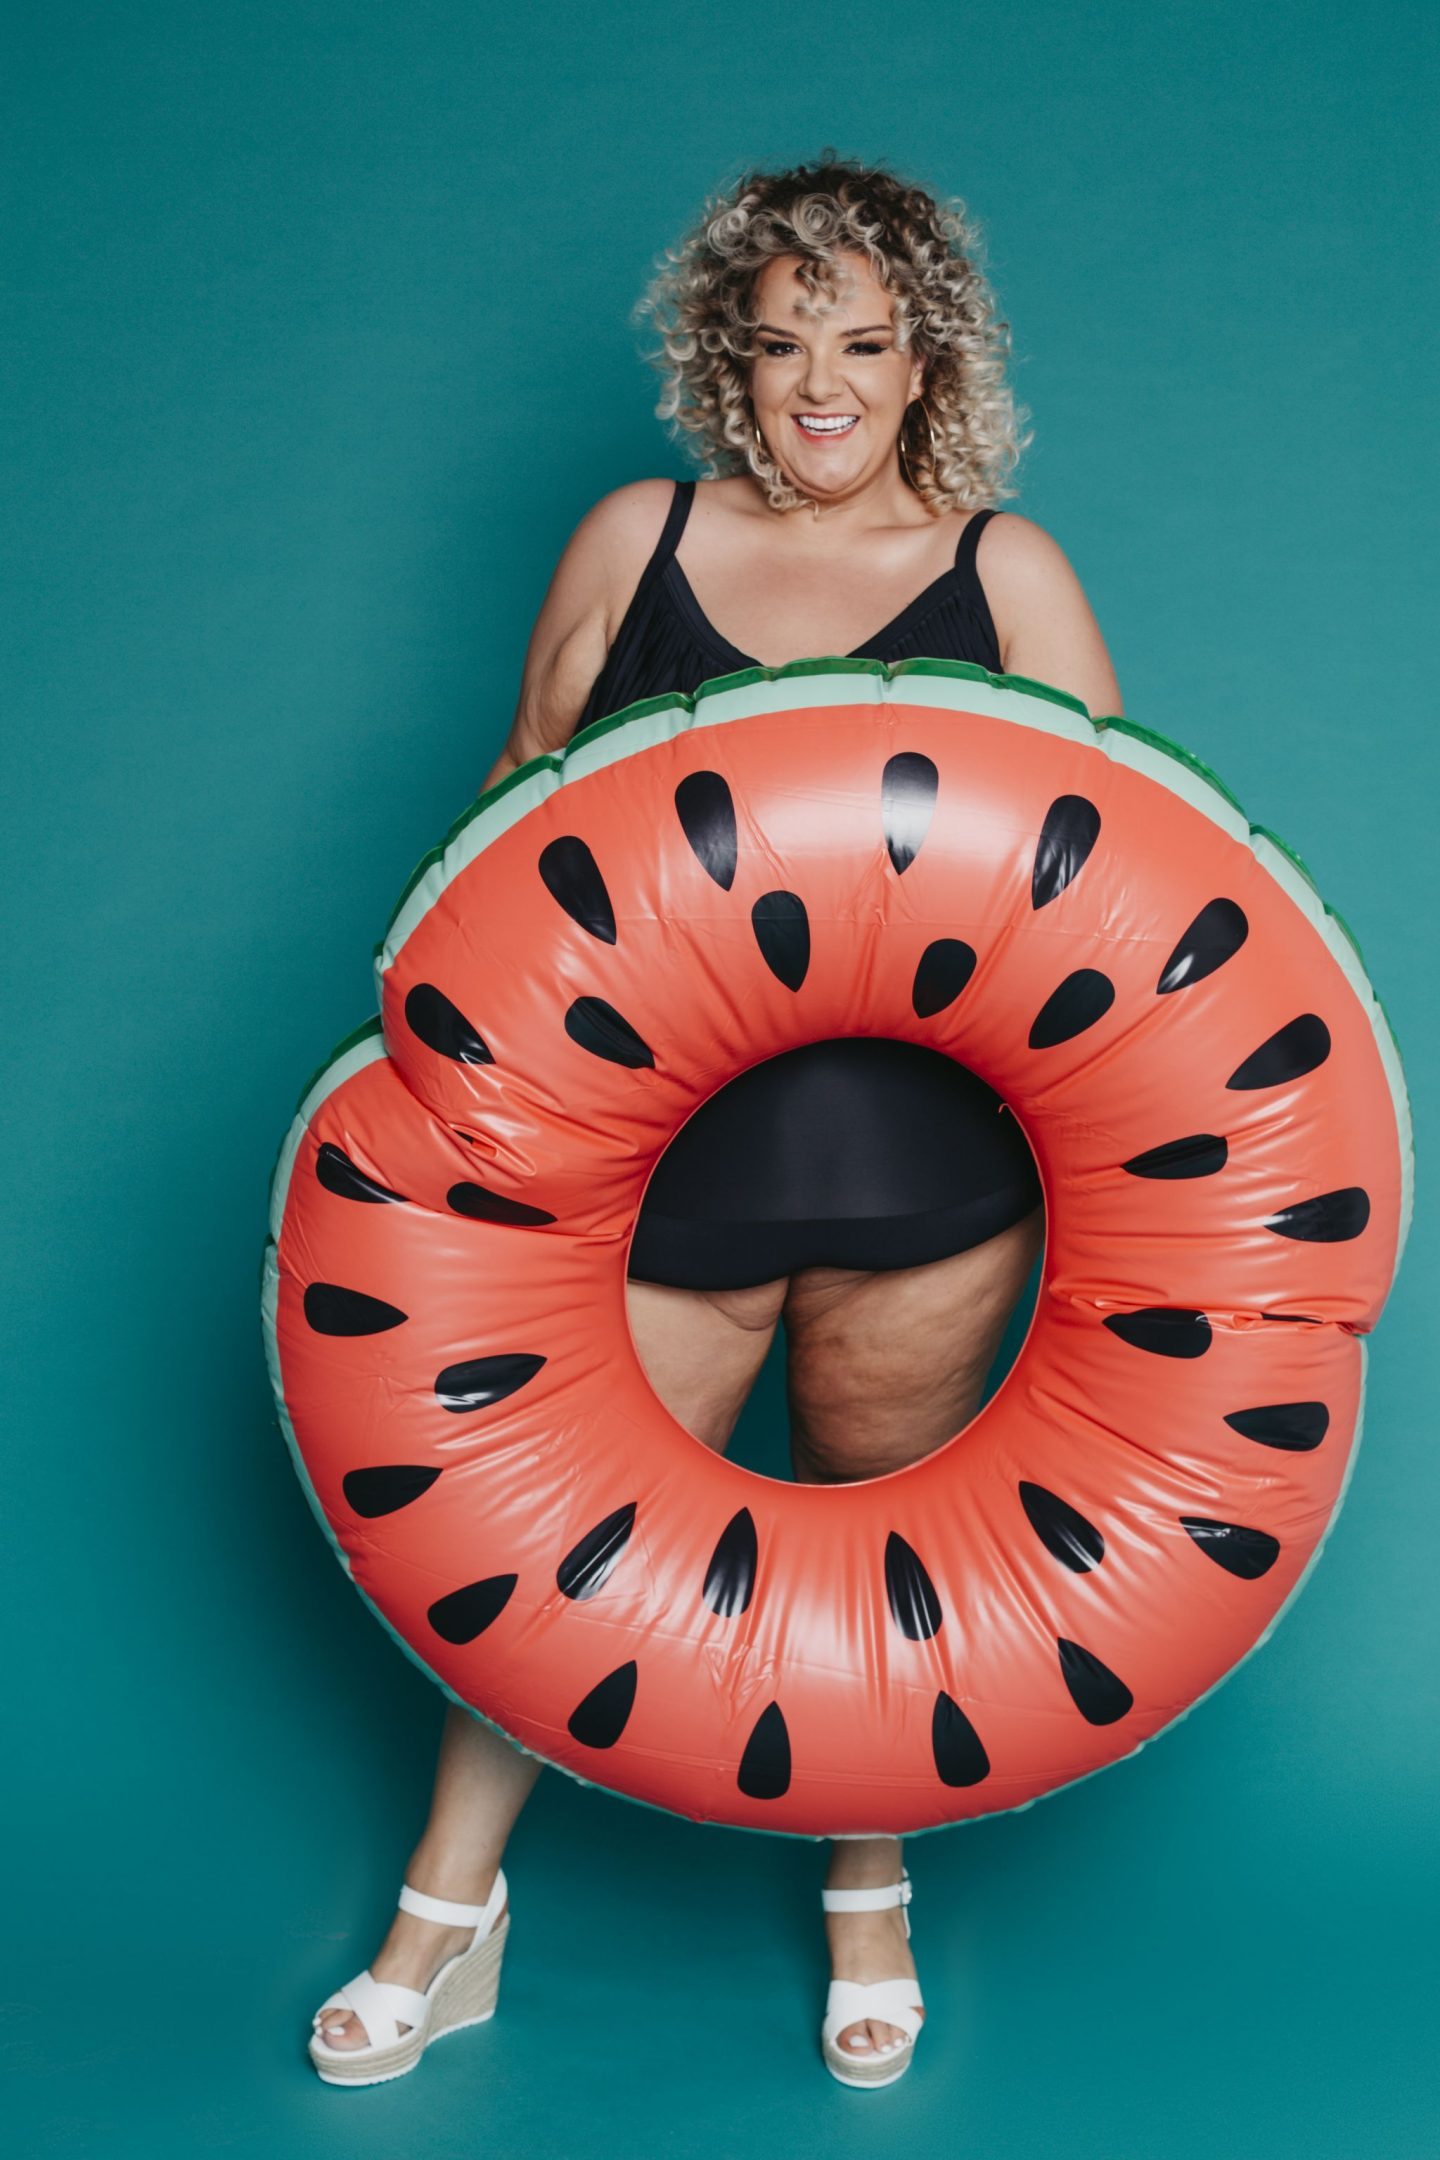 WhatLauraLoves Curvissa Swimwear Body Confident